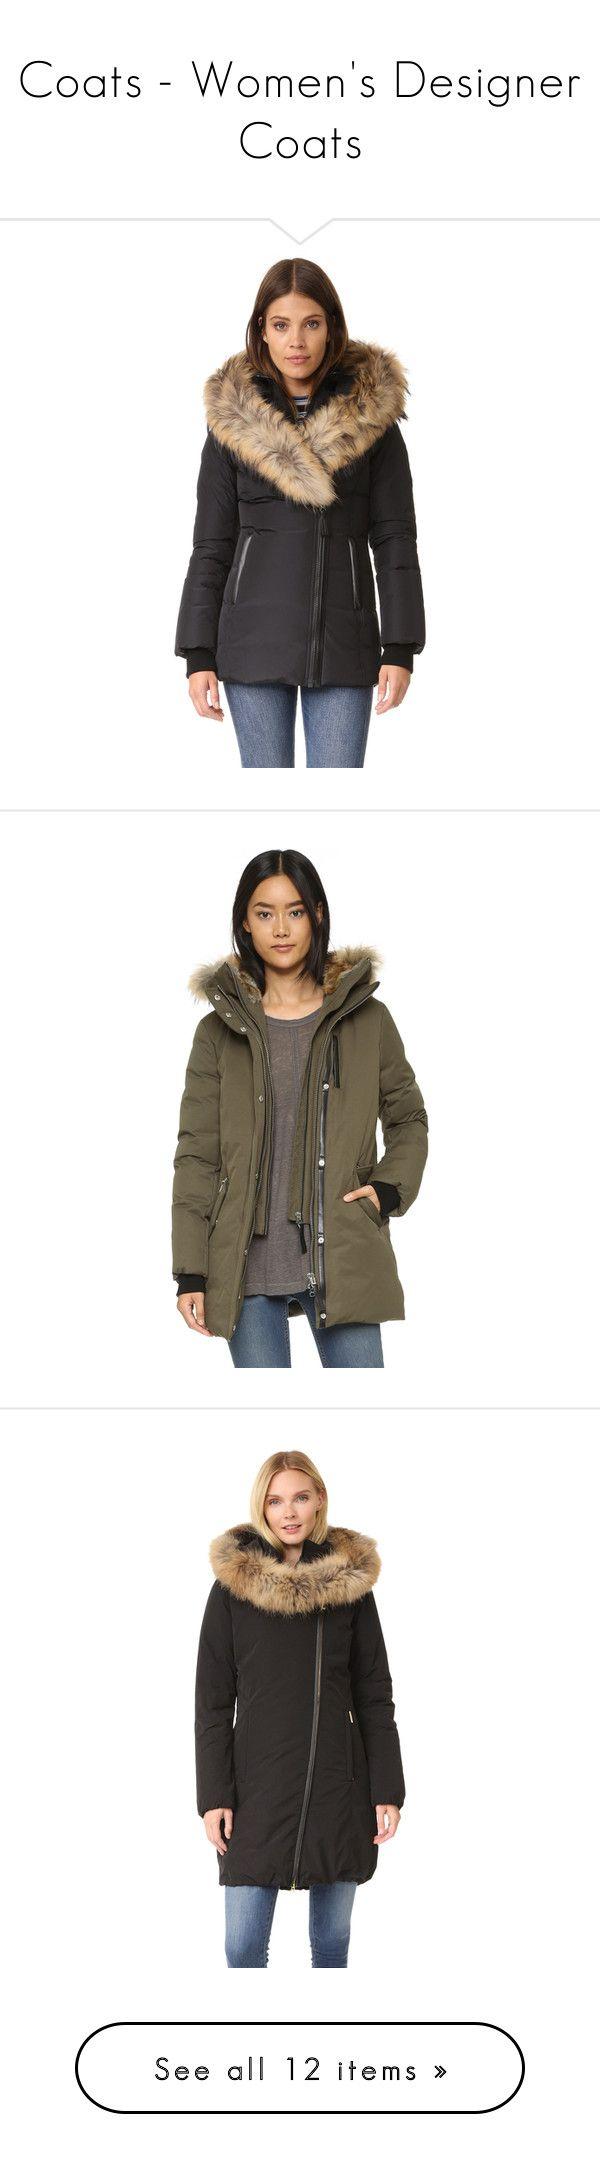 """Coats - Women's Designer Coats"" by modalist ❤ liked on Polyvore featuring outerwear, coats, mackage coats, down filled coats, fur-lined coats, zip coat, mackage, hooded coat, brown coat and fur trim hooded coat"